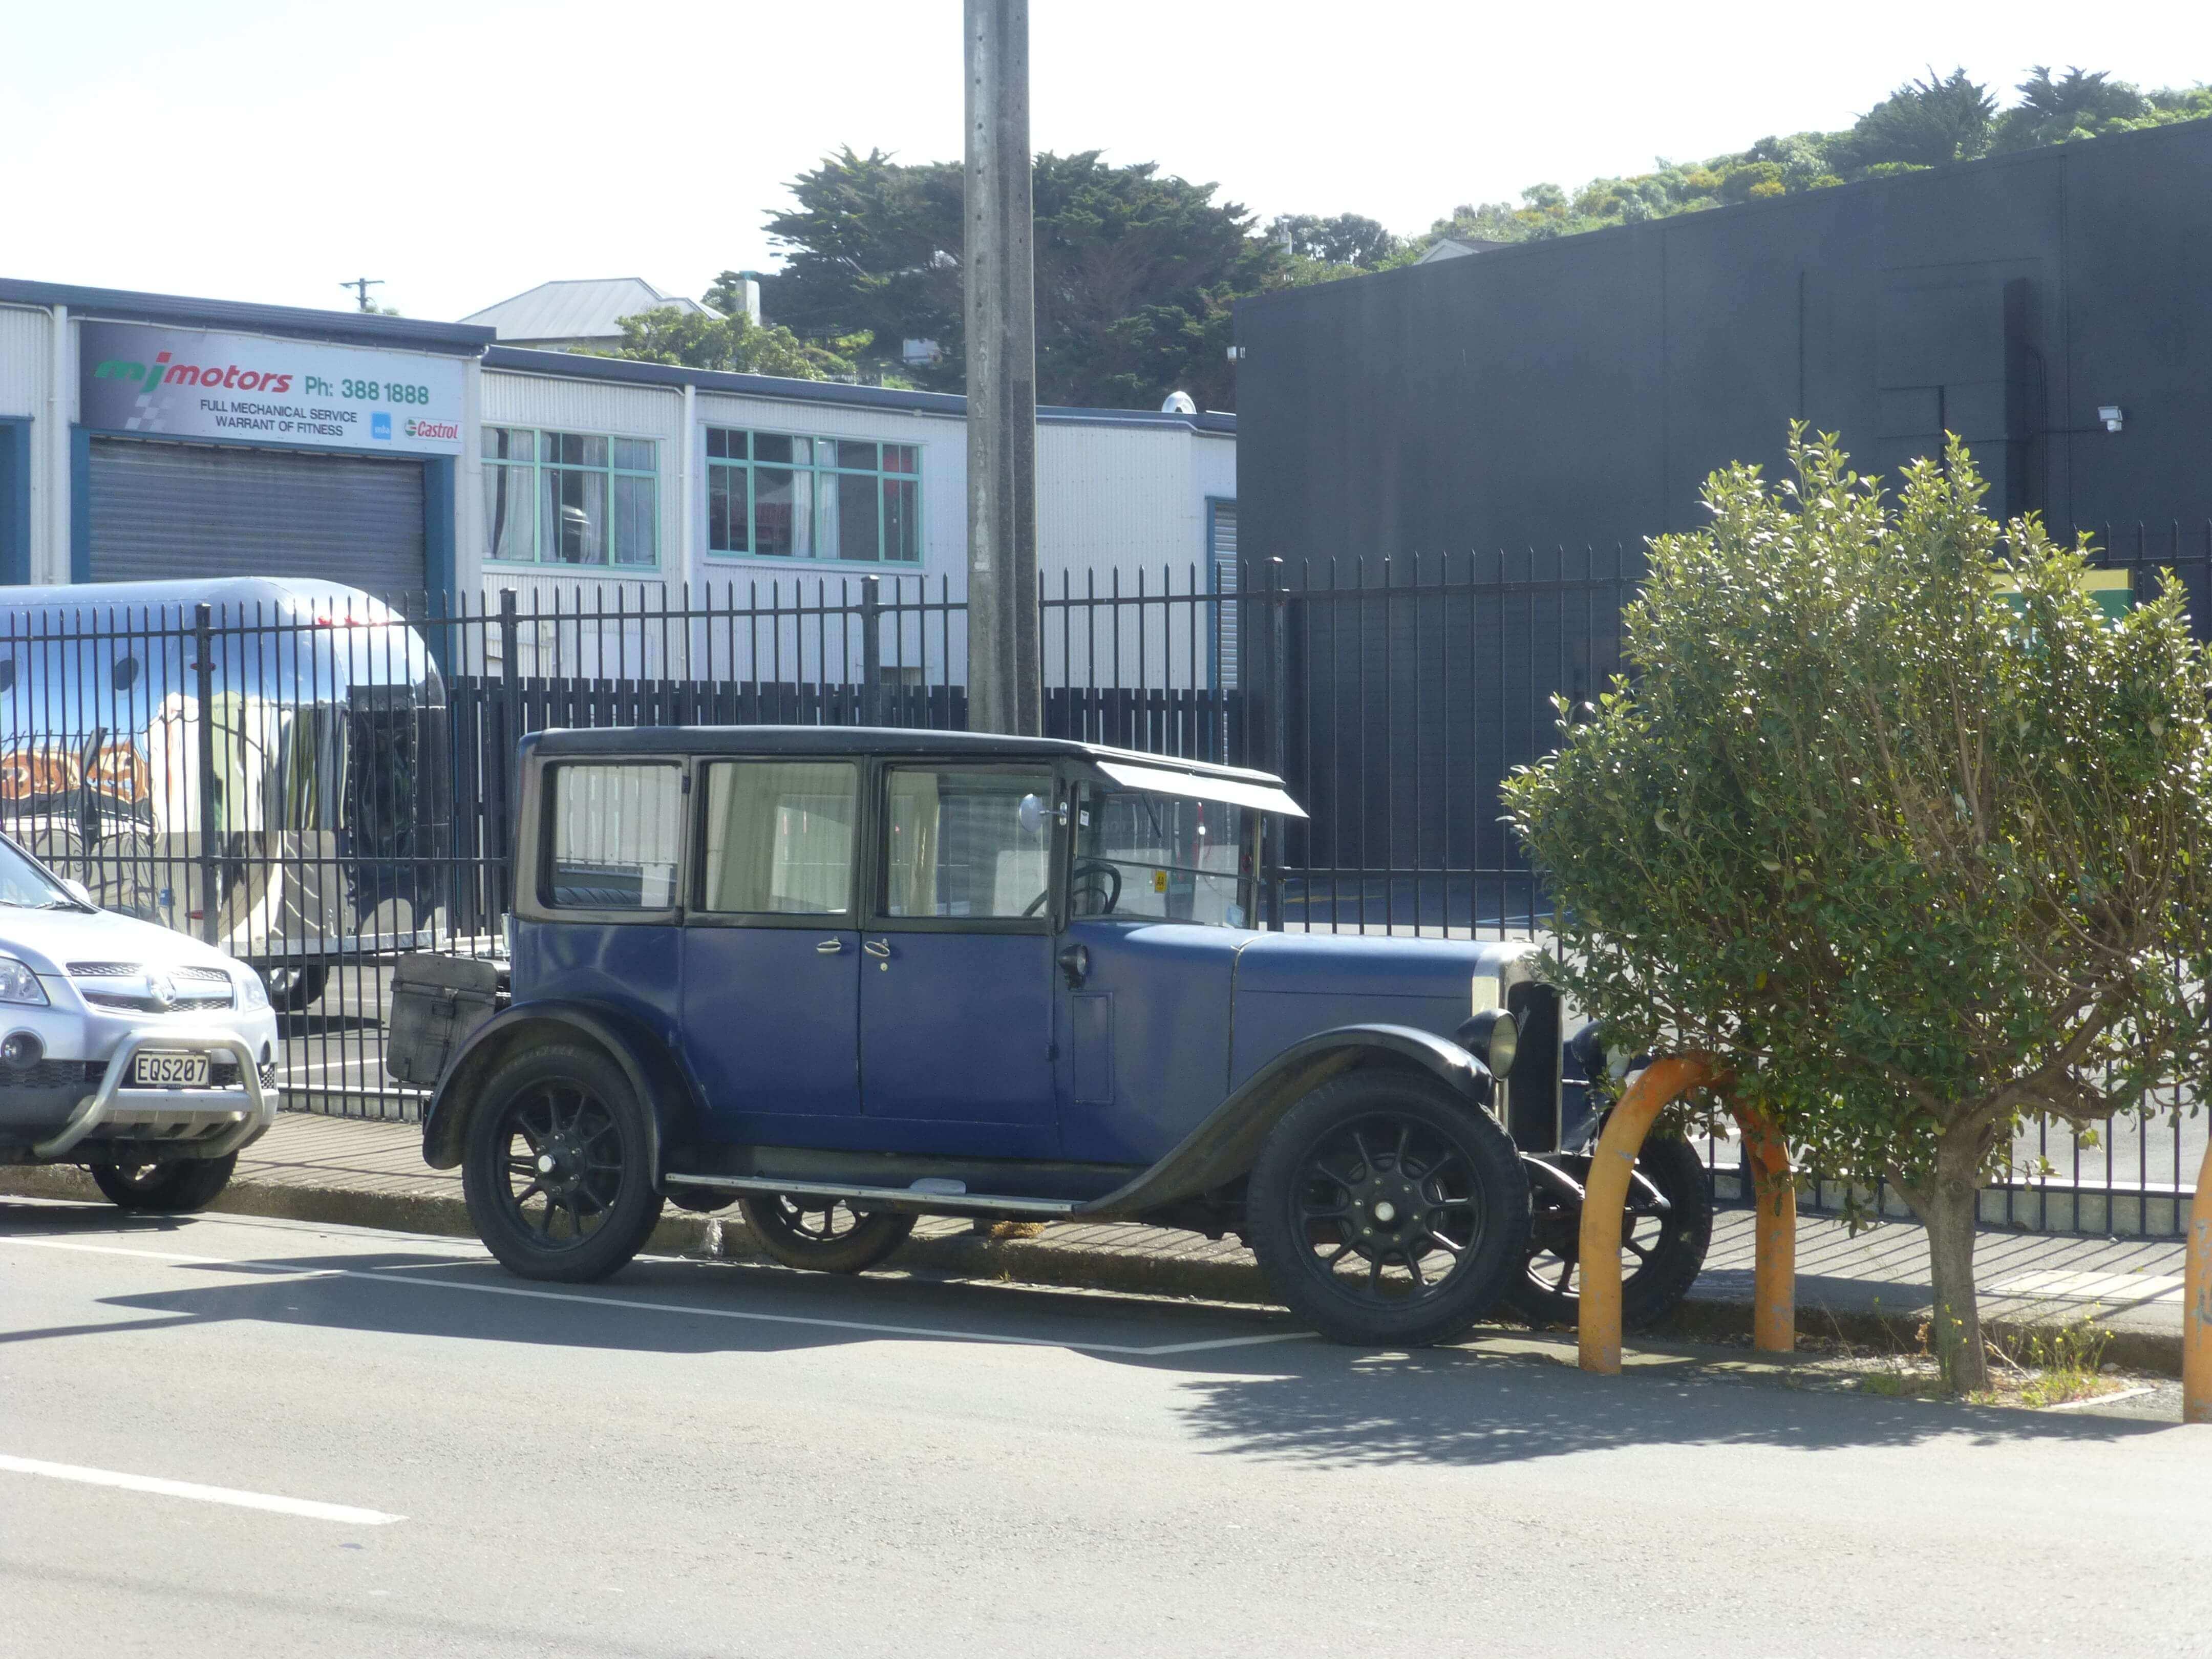 Wellington, in Miramar auf dem Weg zum Weta Shop, Weit-weg.reisen, 15